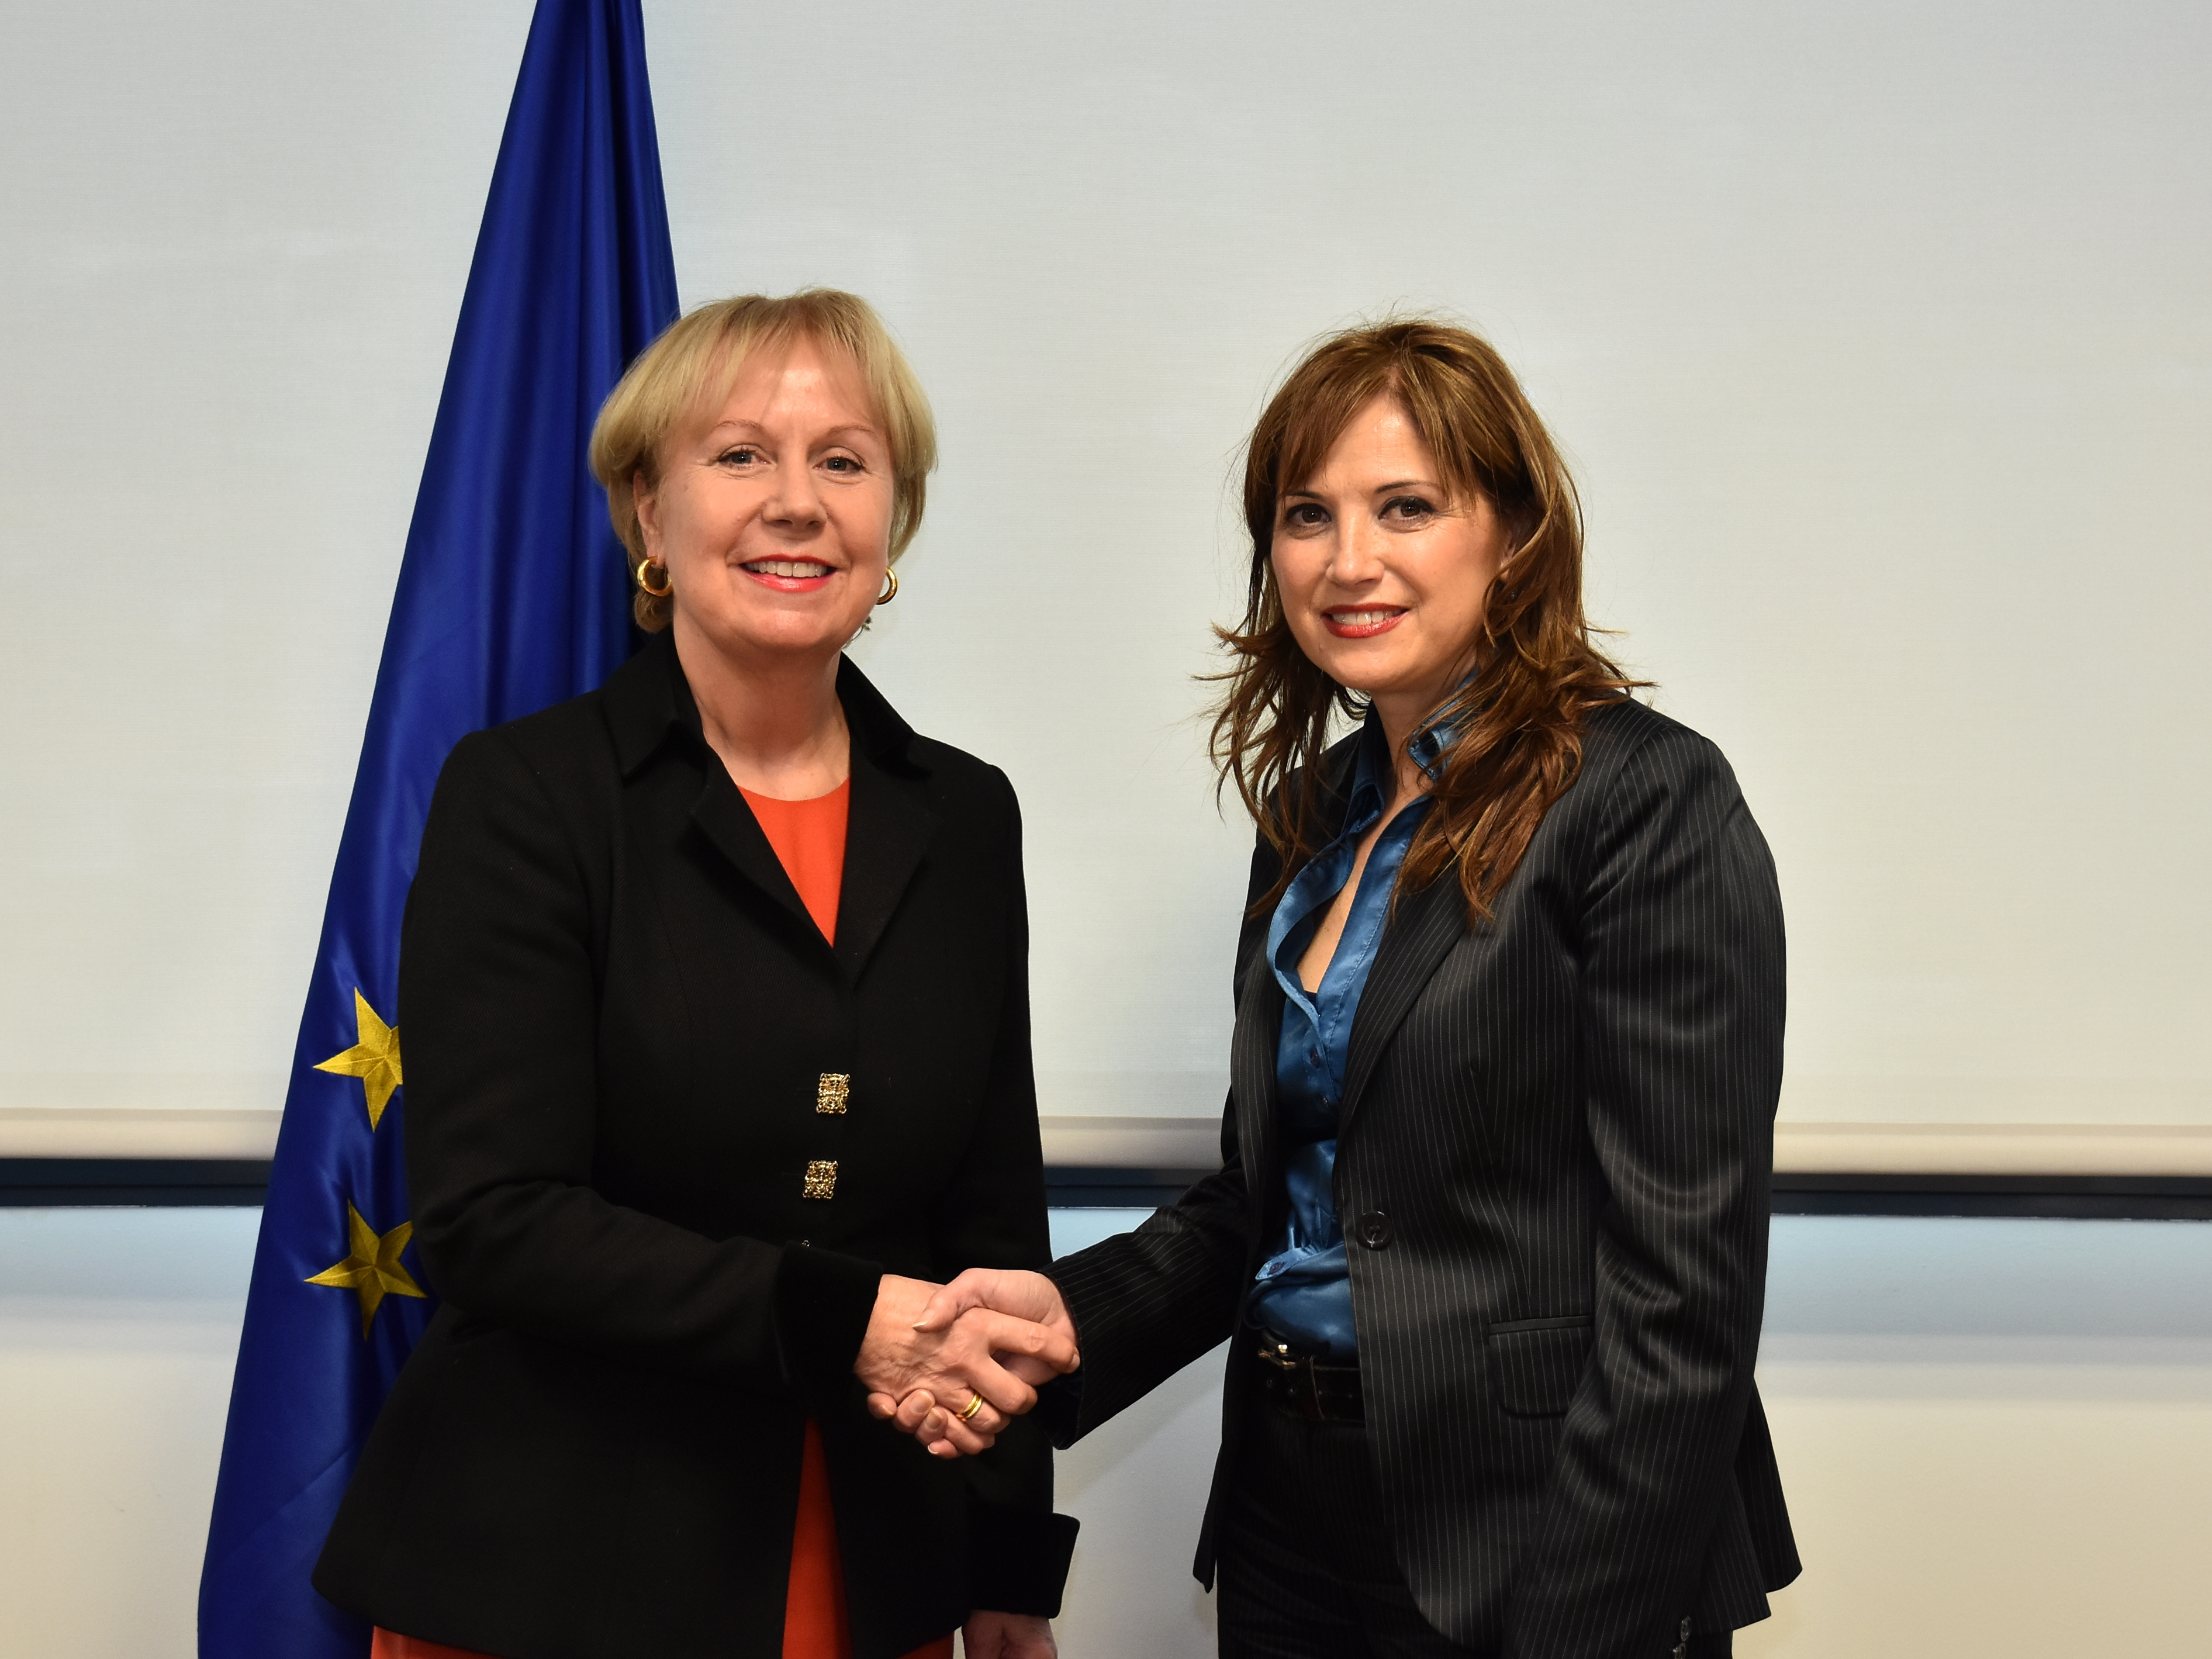 agencia_europea2.JPG